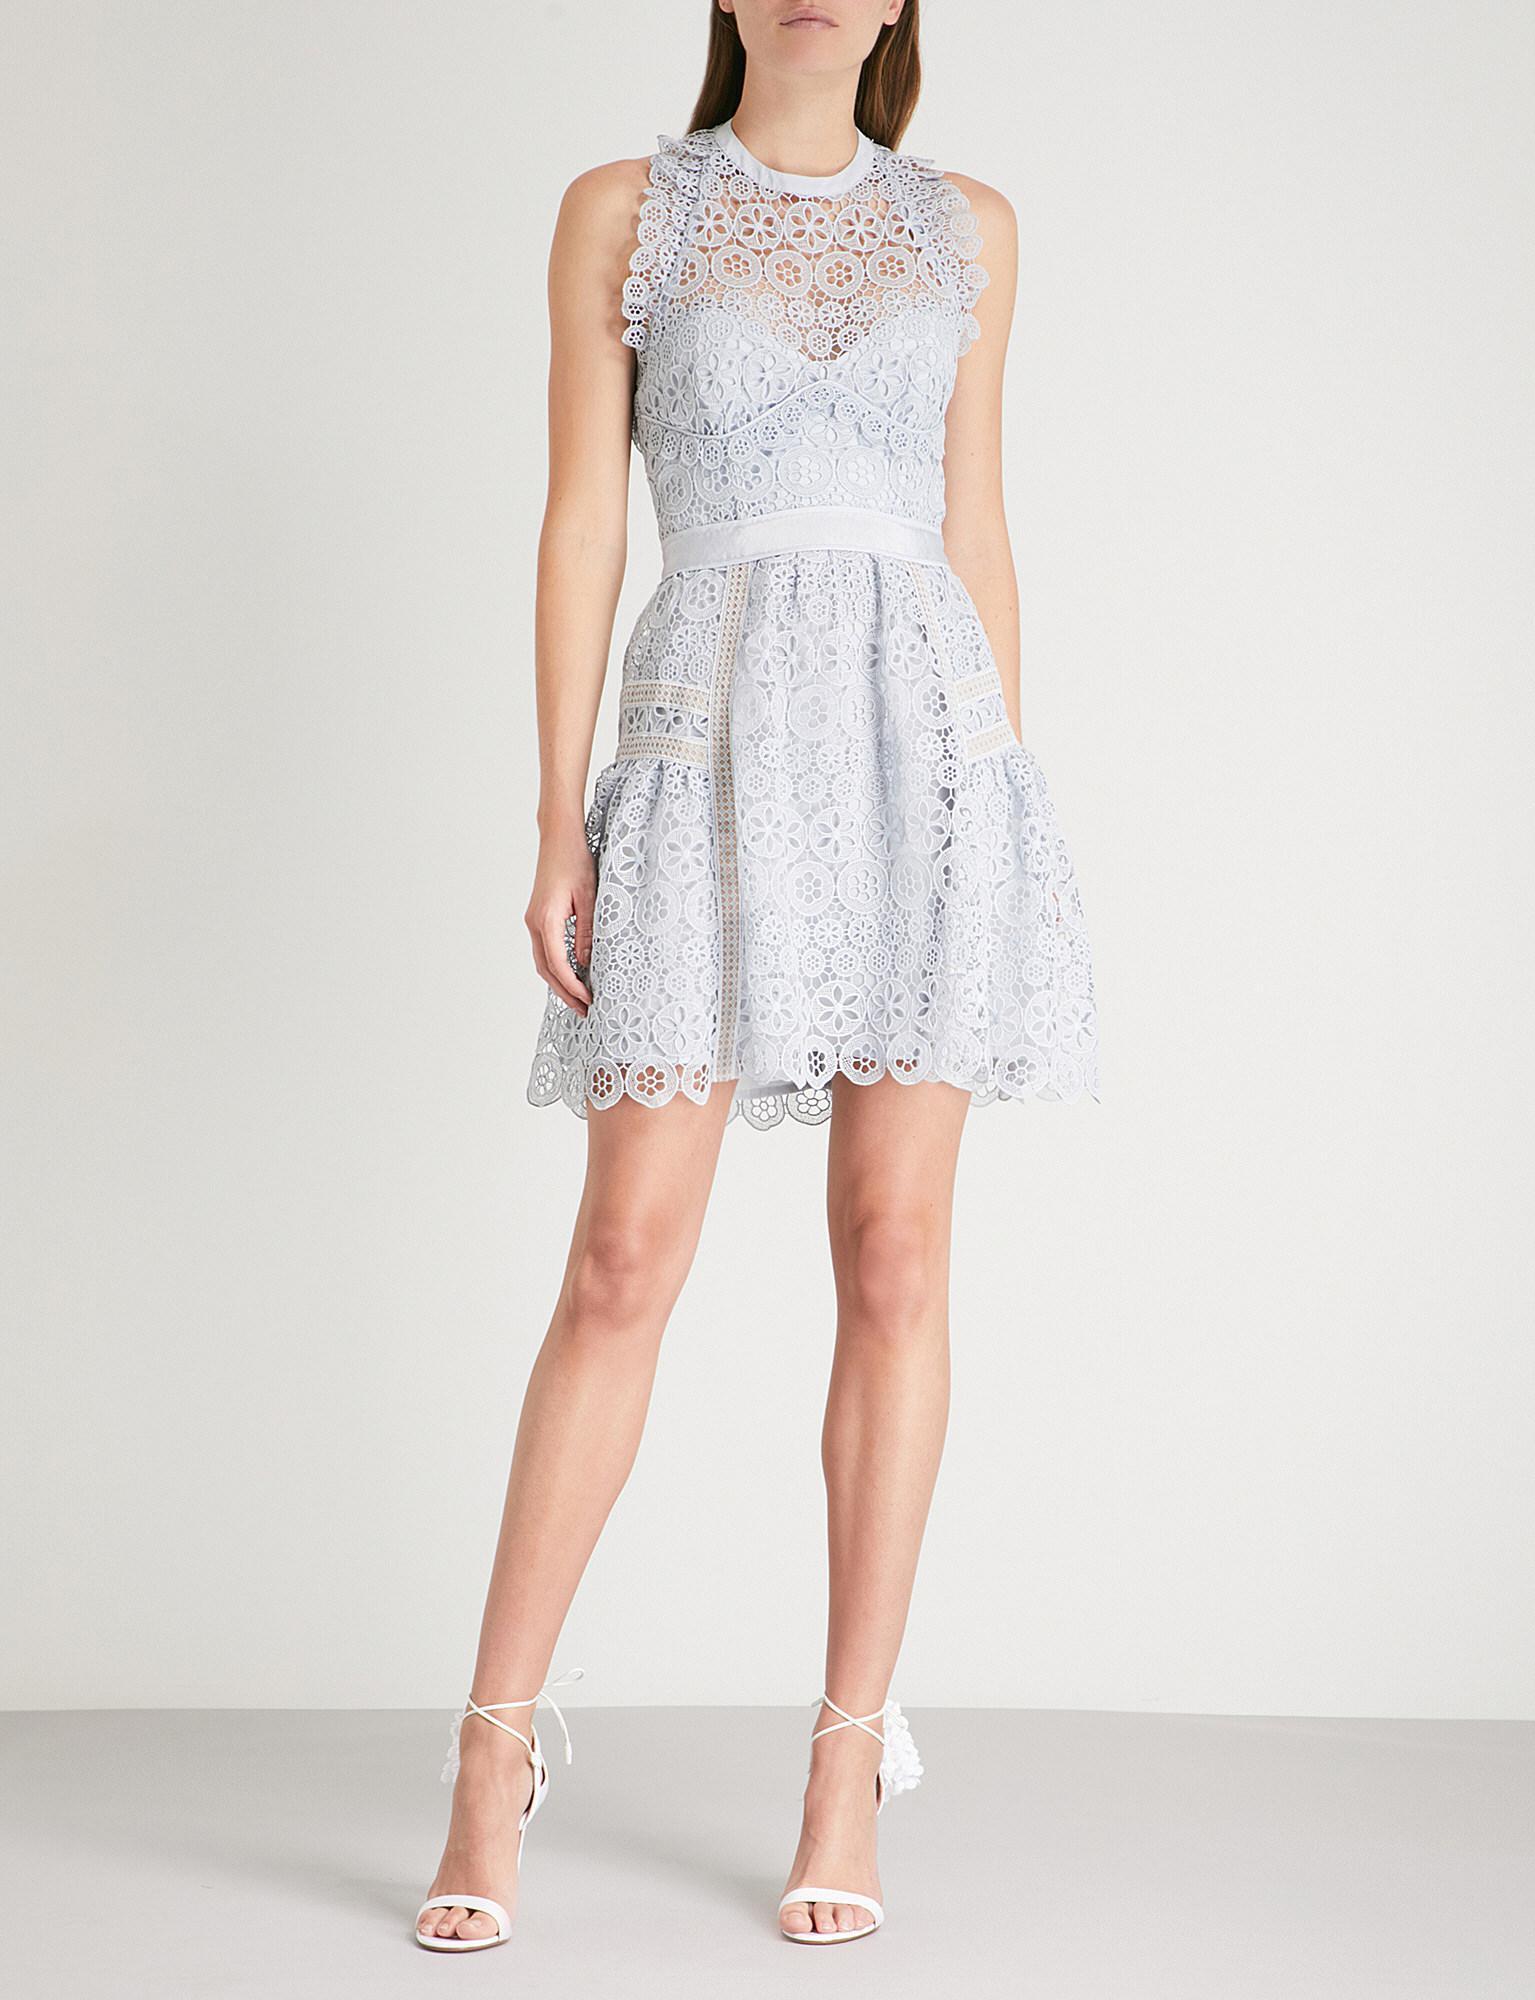 Circle Floral Lace Mini Dress